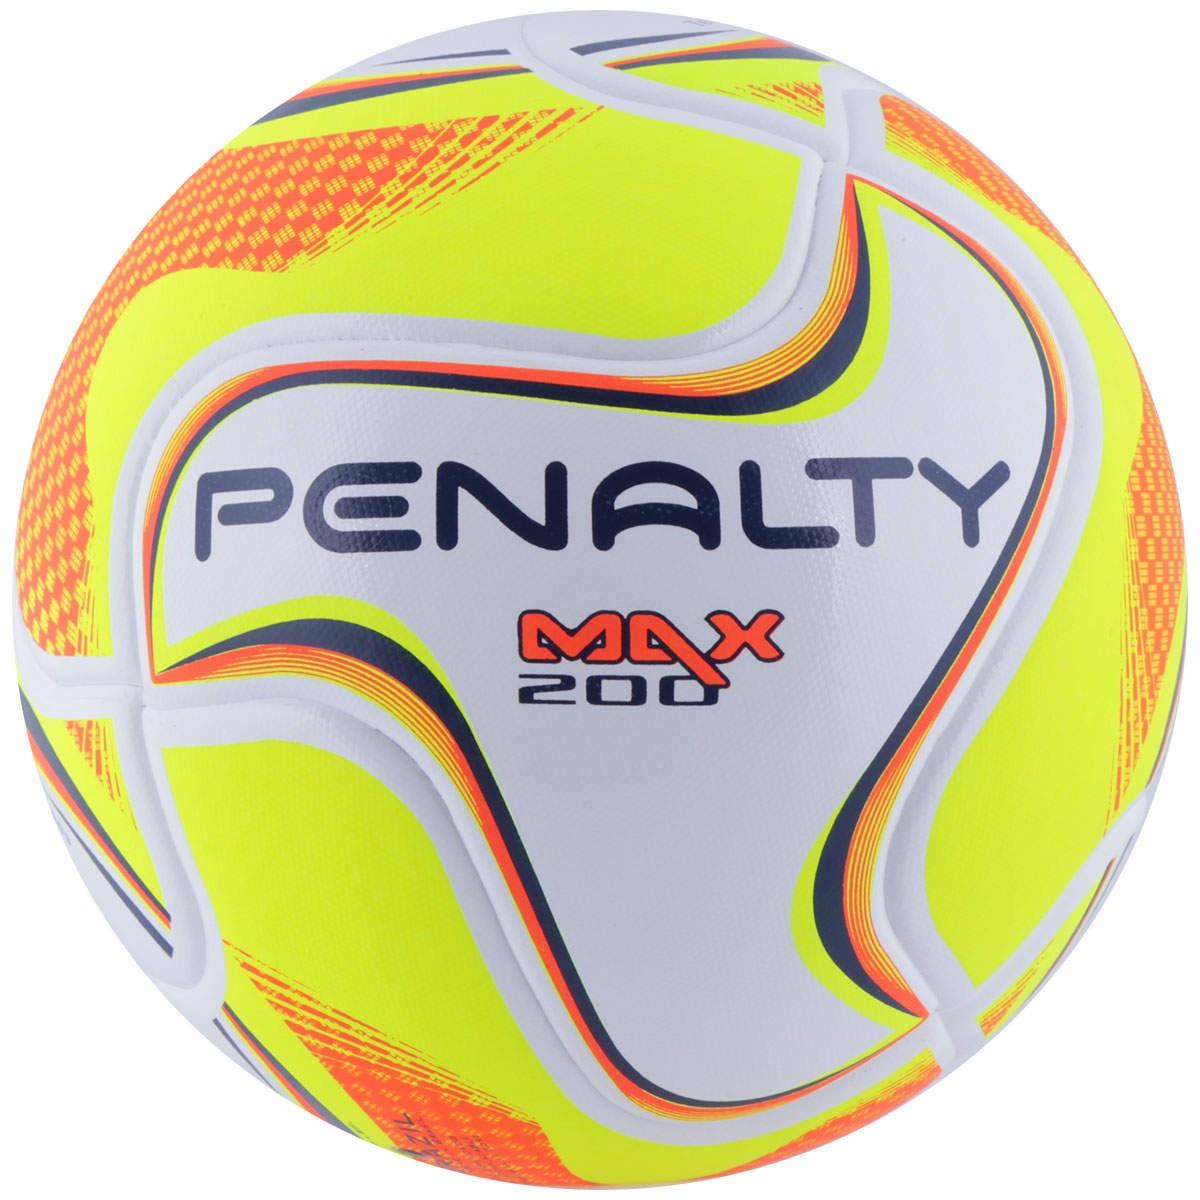 ccc02435c7a9f Bola Penalty Futsal Max 200 Term